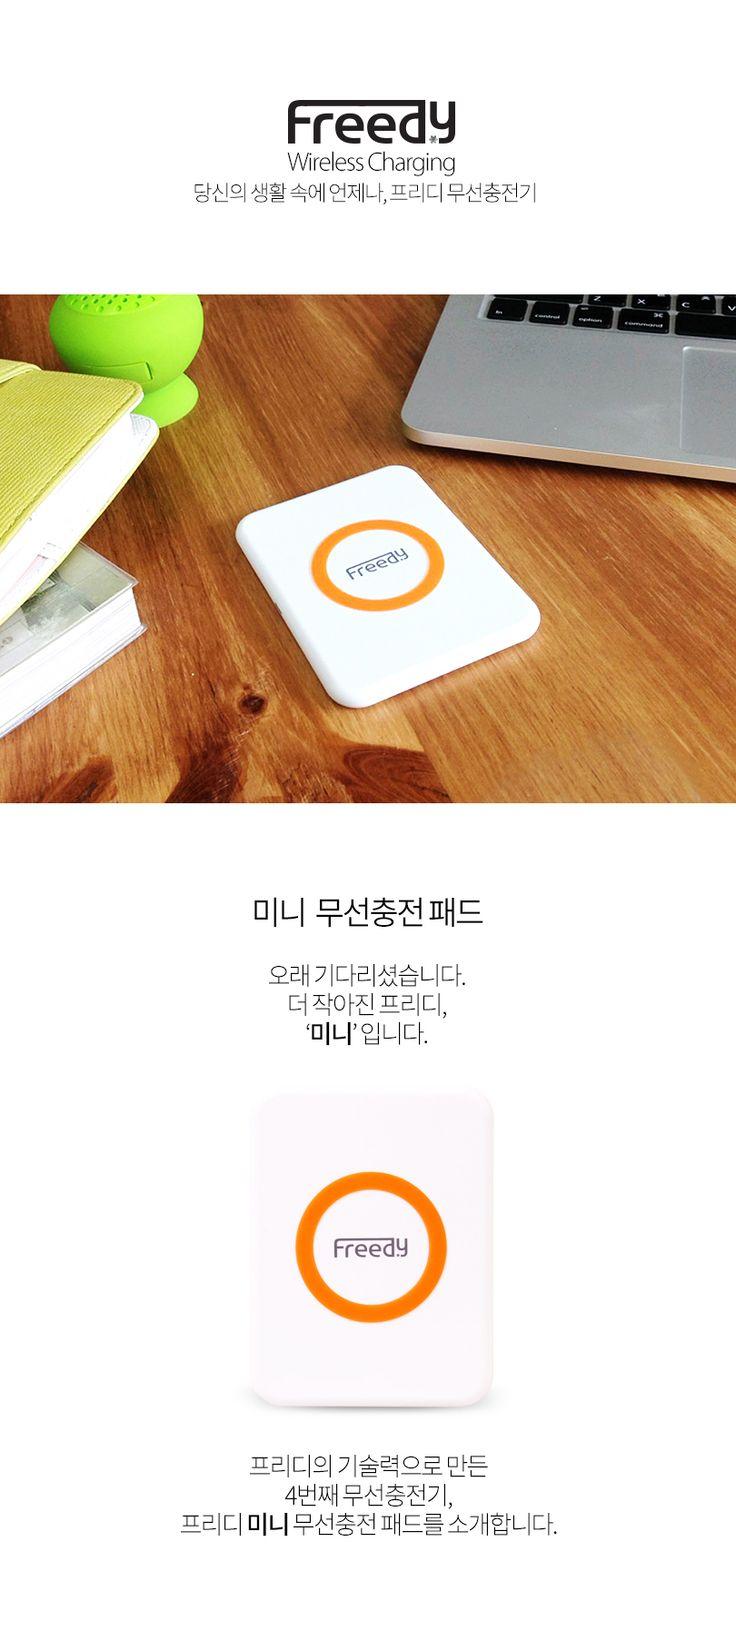 Freedy Mini Wireless Charger KWS-211, Freedy 2015 New Product #WirelessChareger #FreedyWireless #MiniCharger #MiniWirelessCharger #SMAPP #designforsamsung